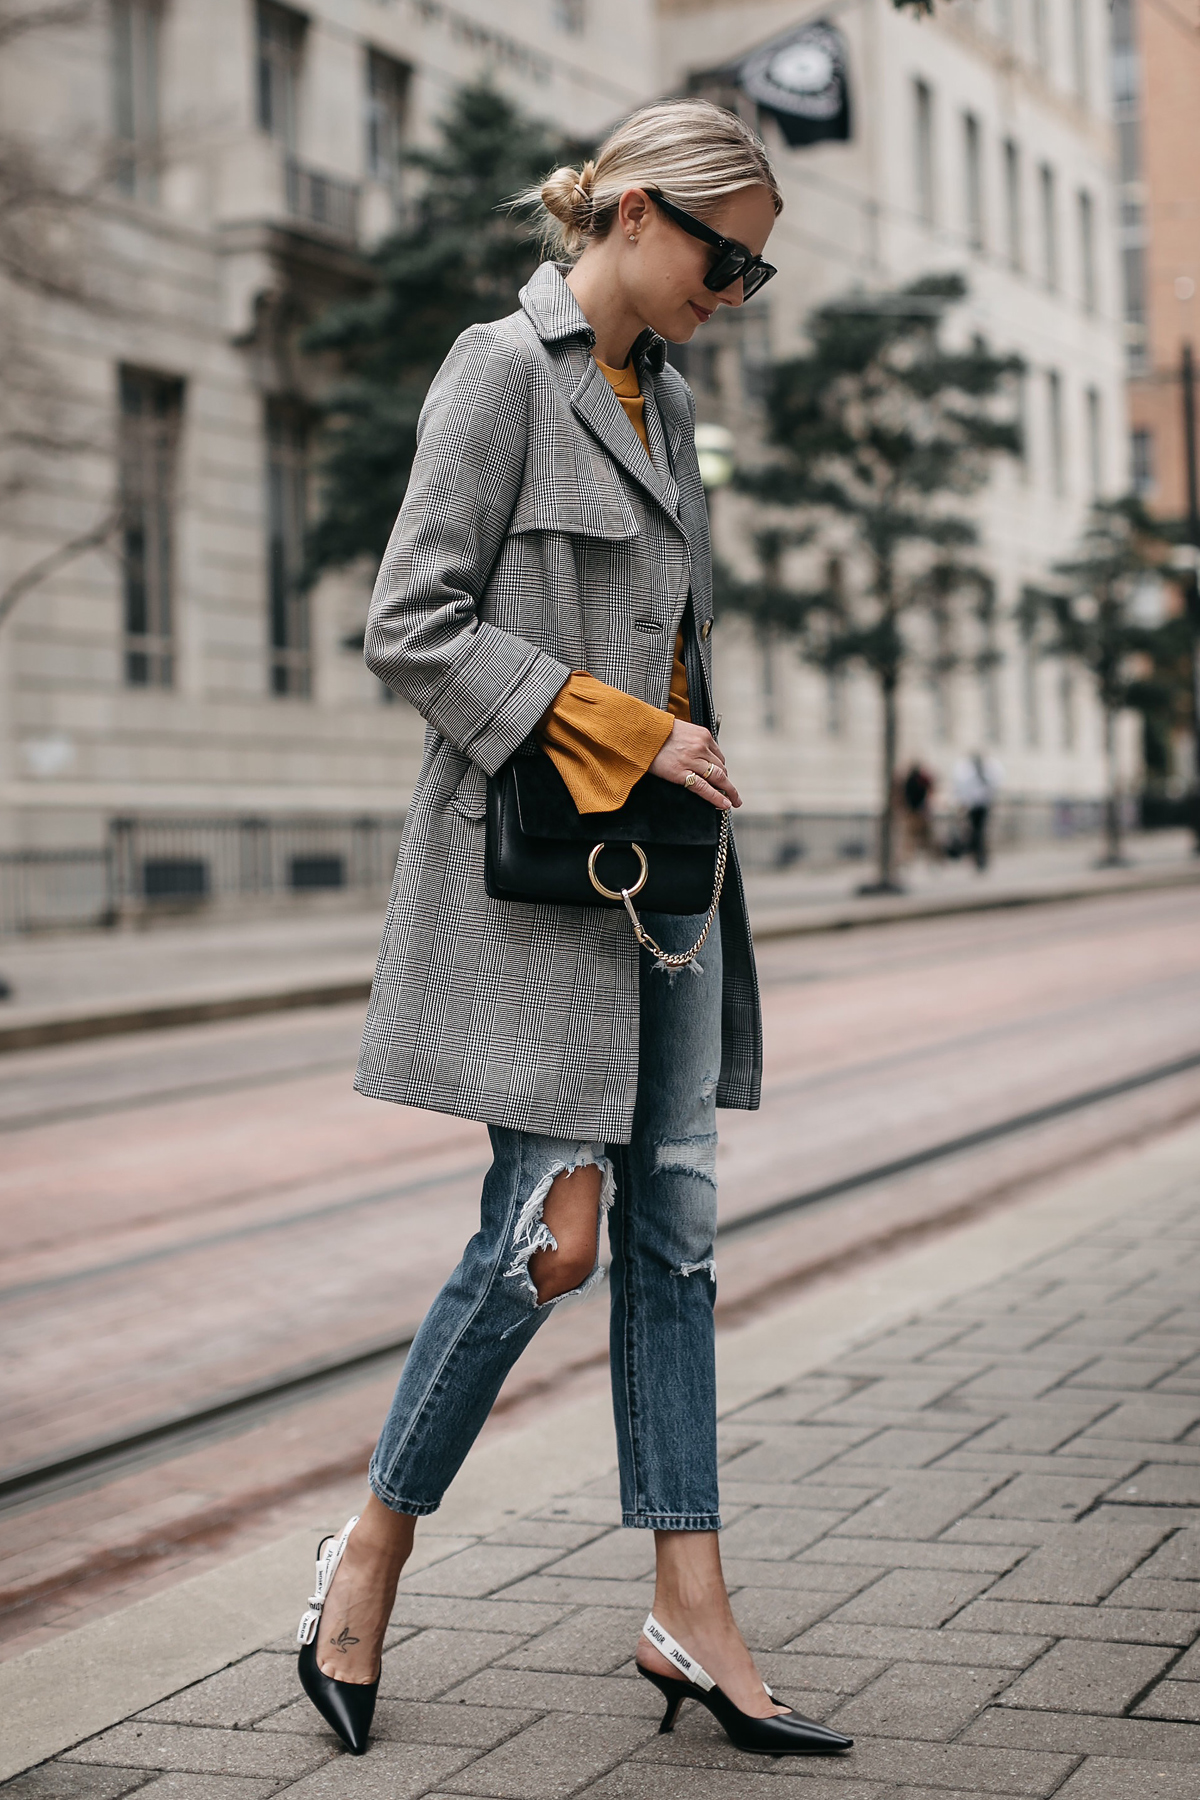 Blonde Woman Wearing Topshop Plaid Trench Coat Marigold Sweater Levis Ripped Jeans Dior Slingbacks Chloe Faye Handbag Fashion Jackson Dallas Blogger Fashion Blogger Street Style